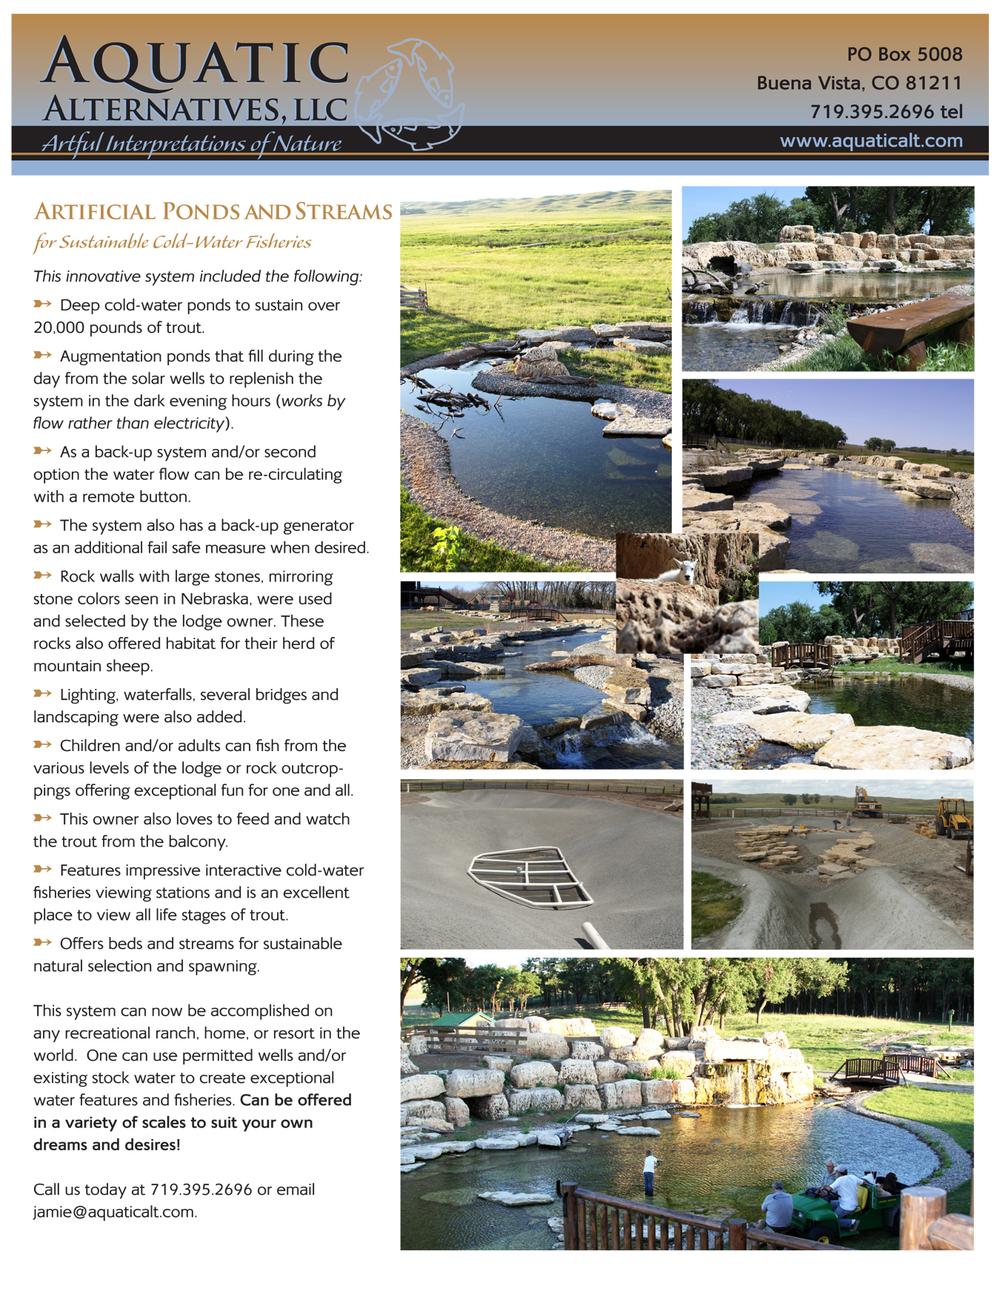 AA-Art-Ponds-str2.jpg